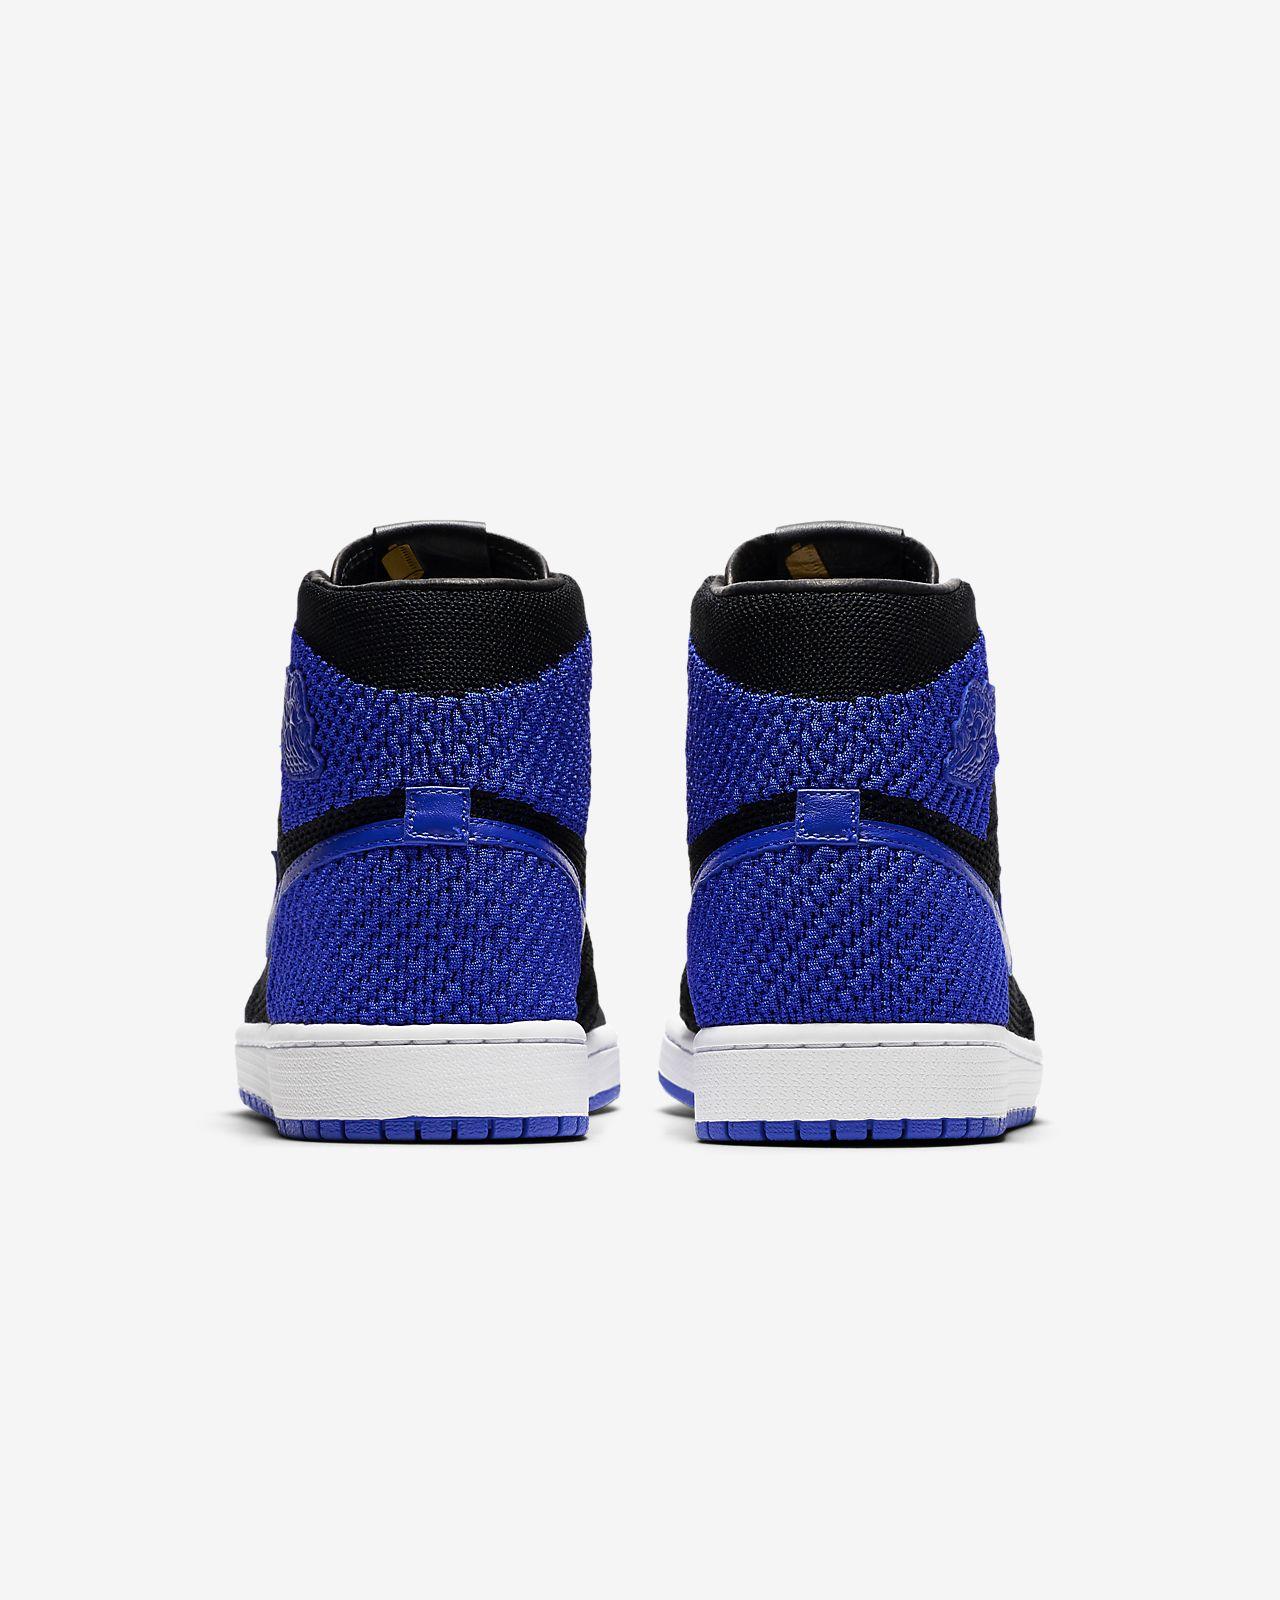 c16d0b5d8cc86 Calzado para hombre Air Jordan 1 Retro High Flyknit. Nike.com MX